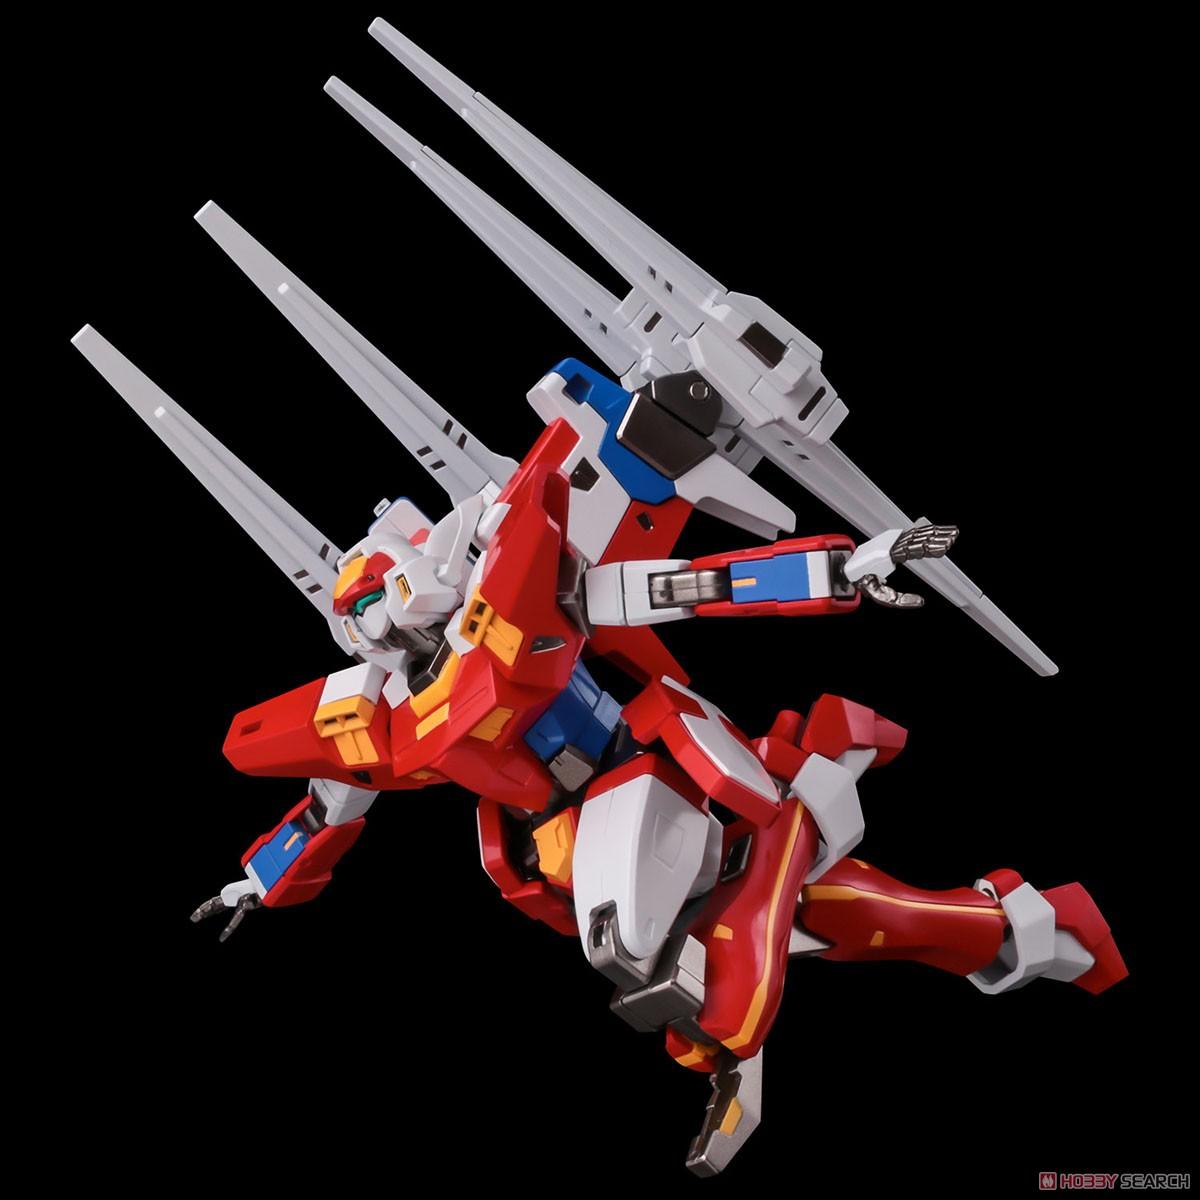 RIOBOT『変形合体 R-1』スーパーロボット大戦OG 可変合体フィギュア-034